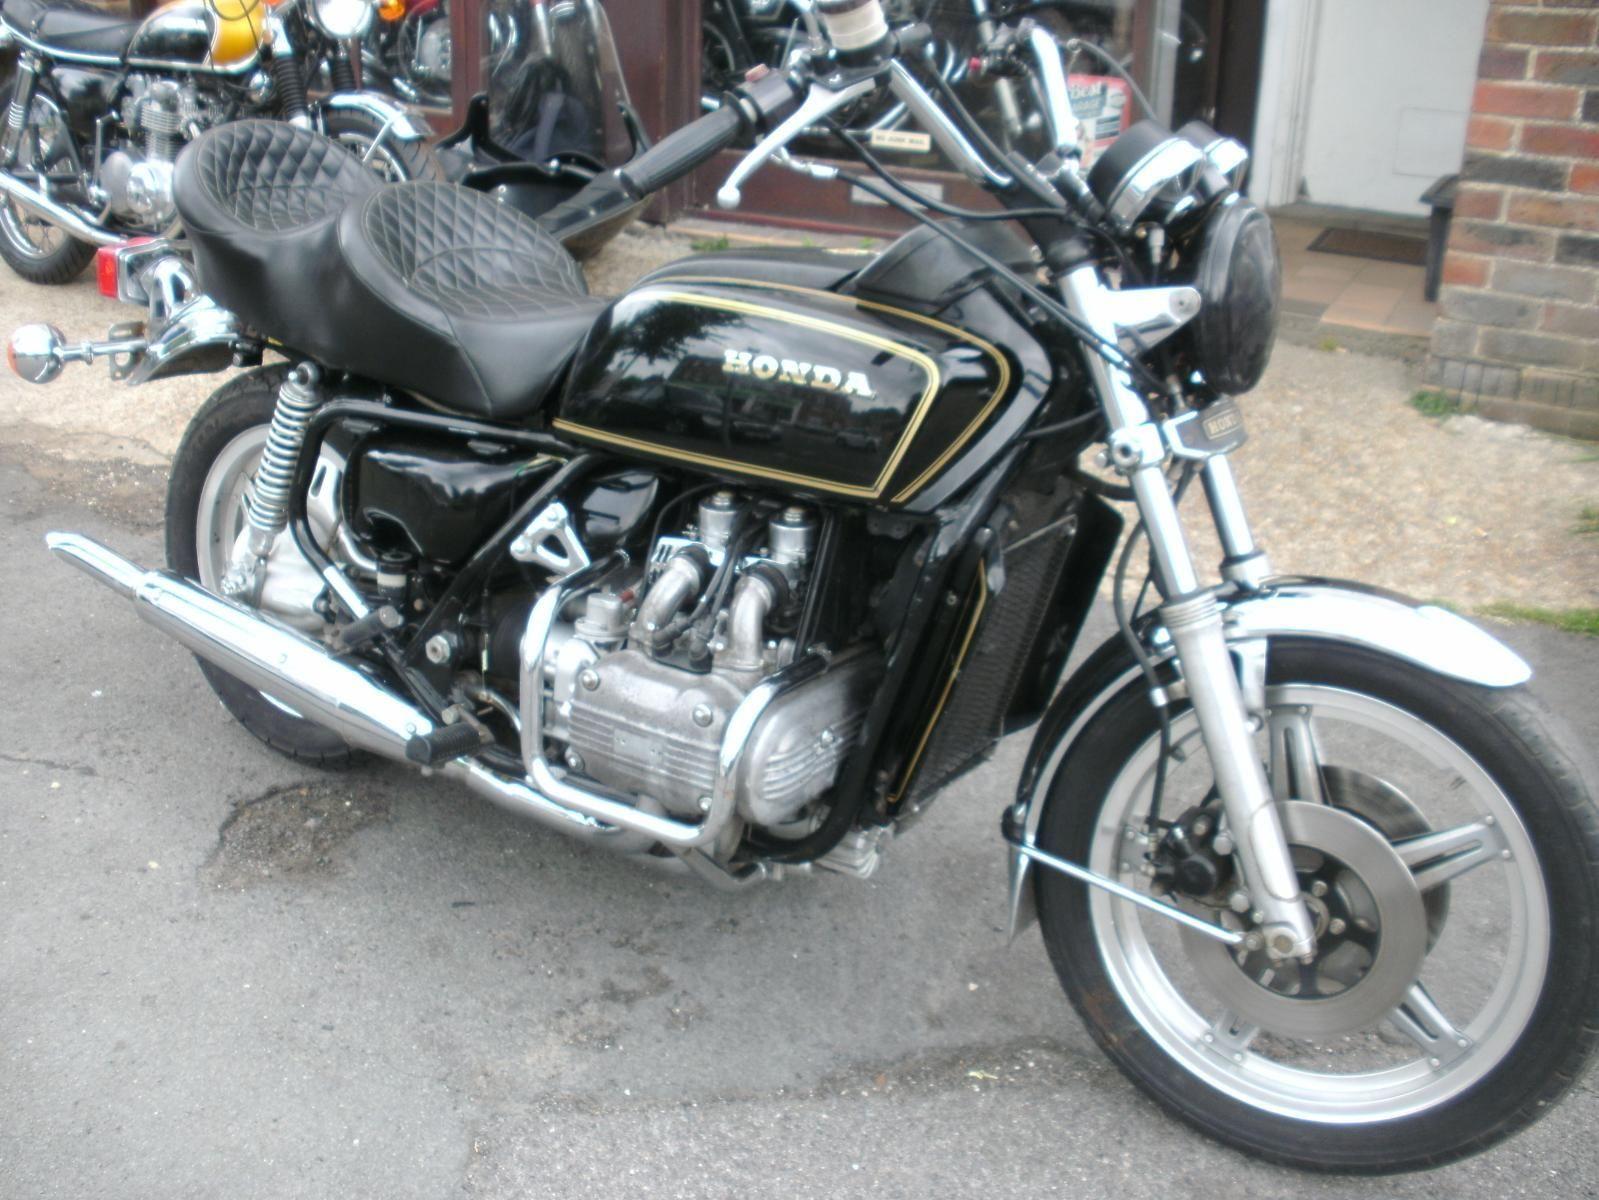 1979 honda goldwing gl1000 eighties super bike project or restore 1979 Honda GL1000 1979 honda goldwing gl1000 eighties super bike project or restore 1299 ebay